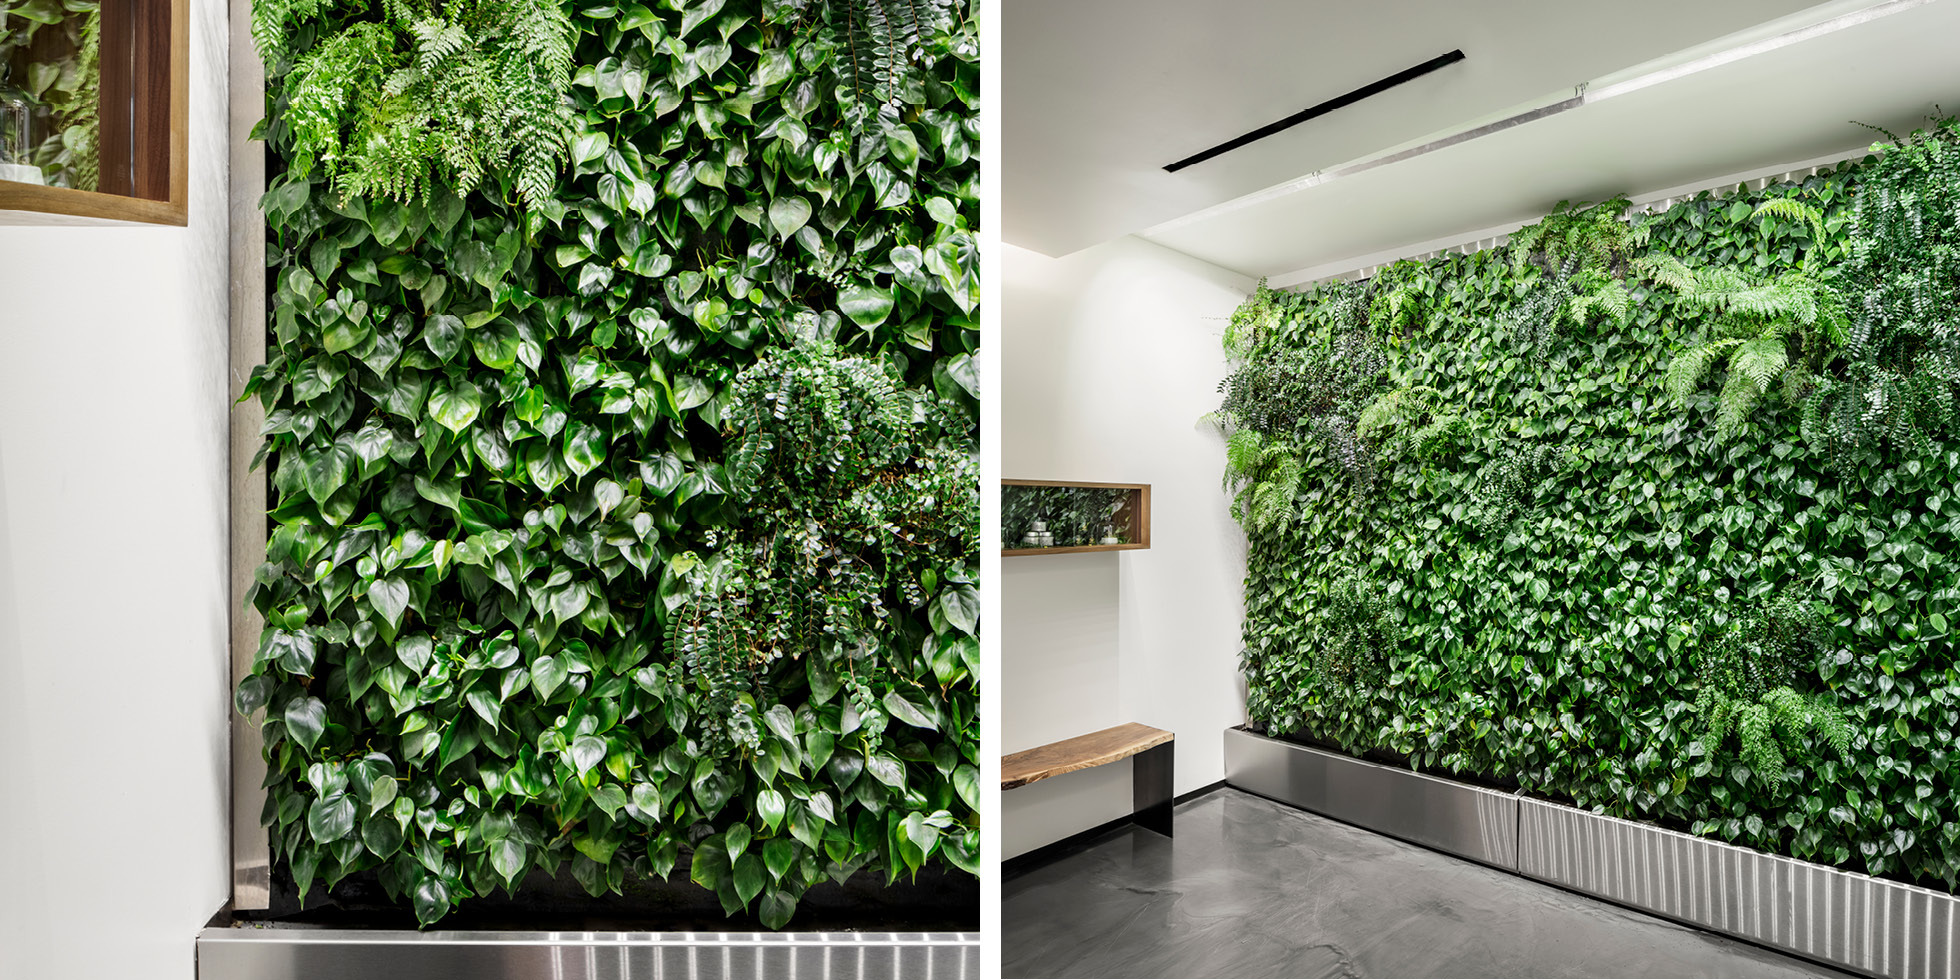 Garden of Eden  Living Wall by Habitat Horticulture - View 3